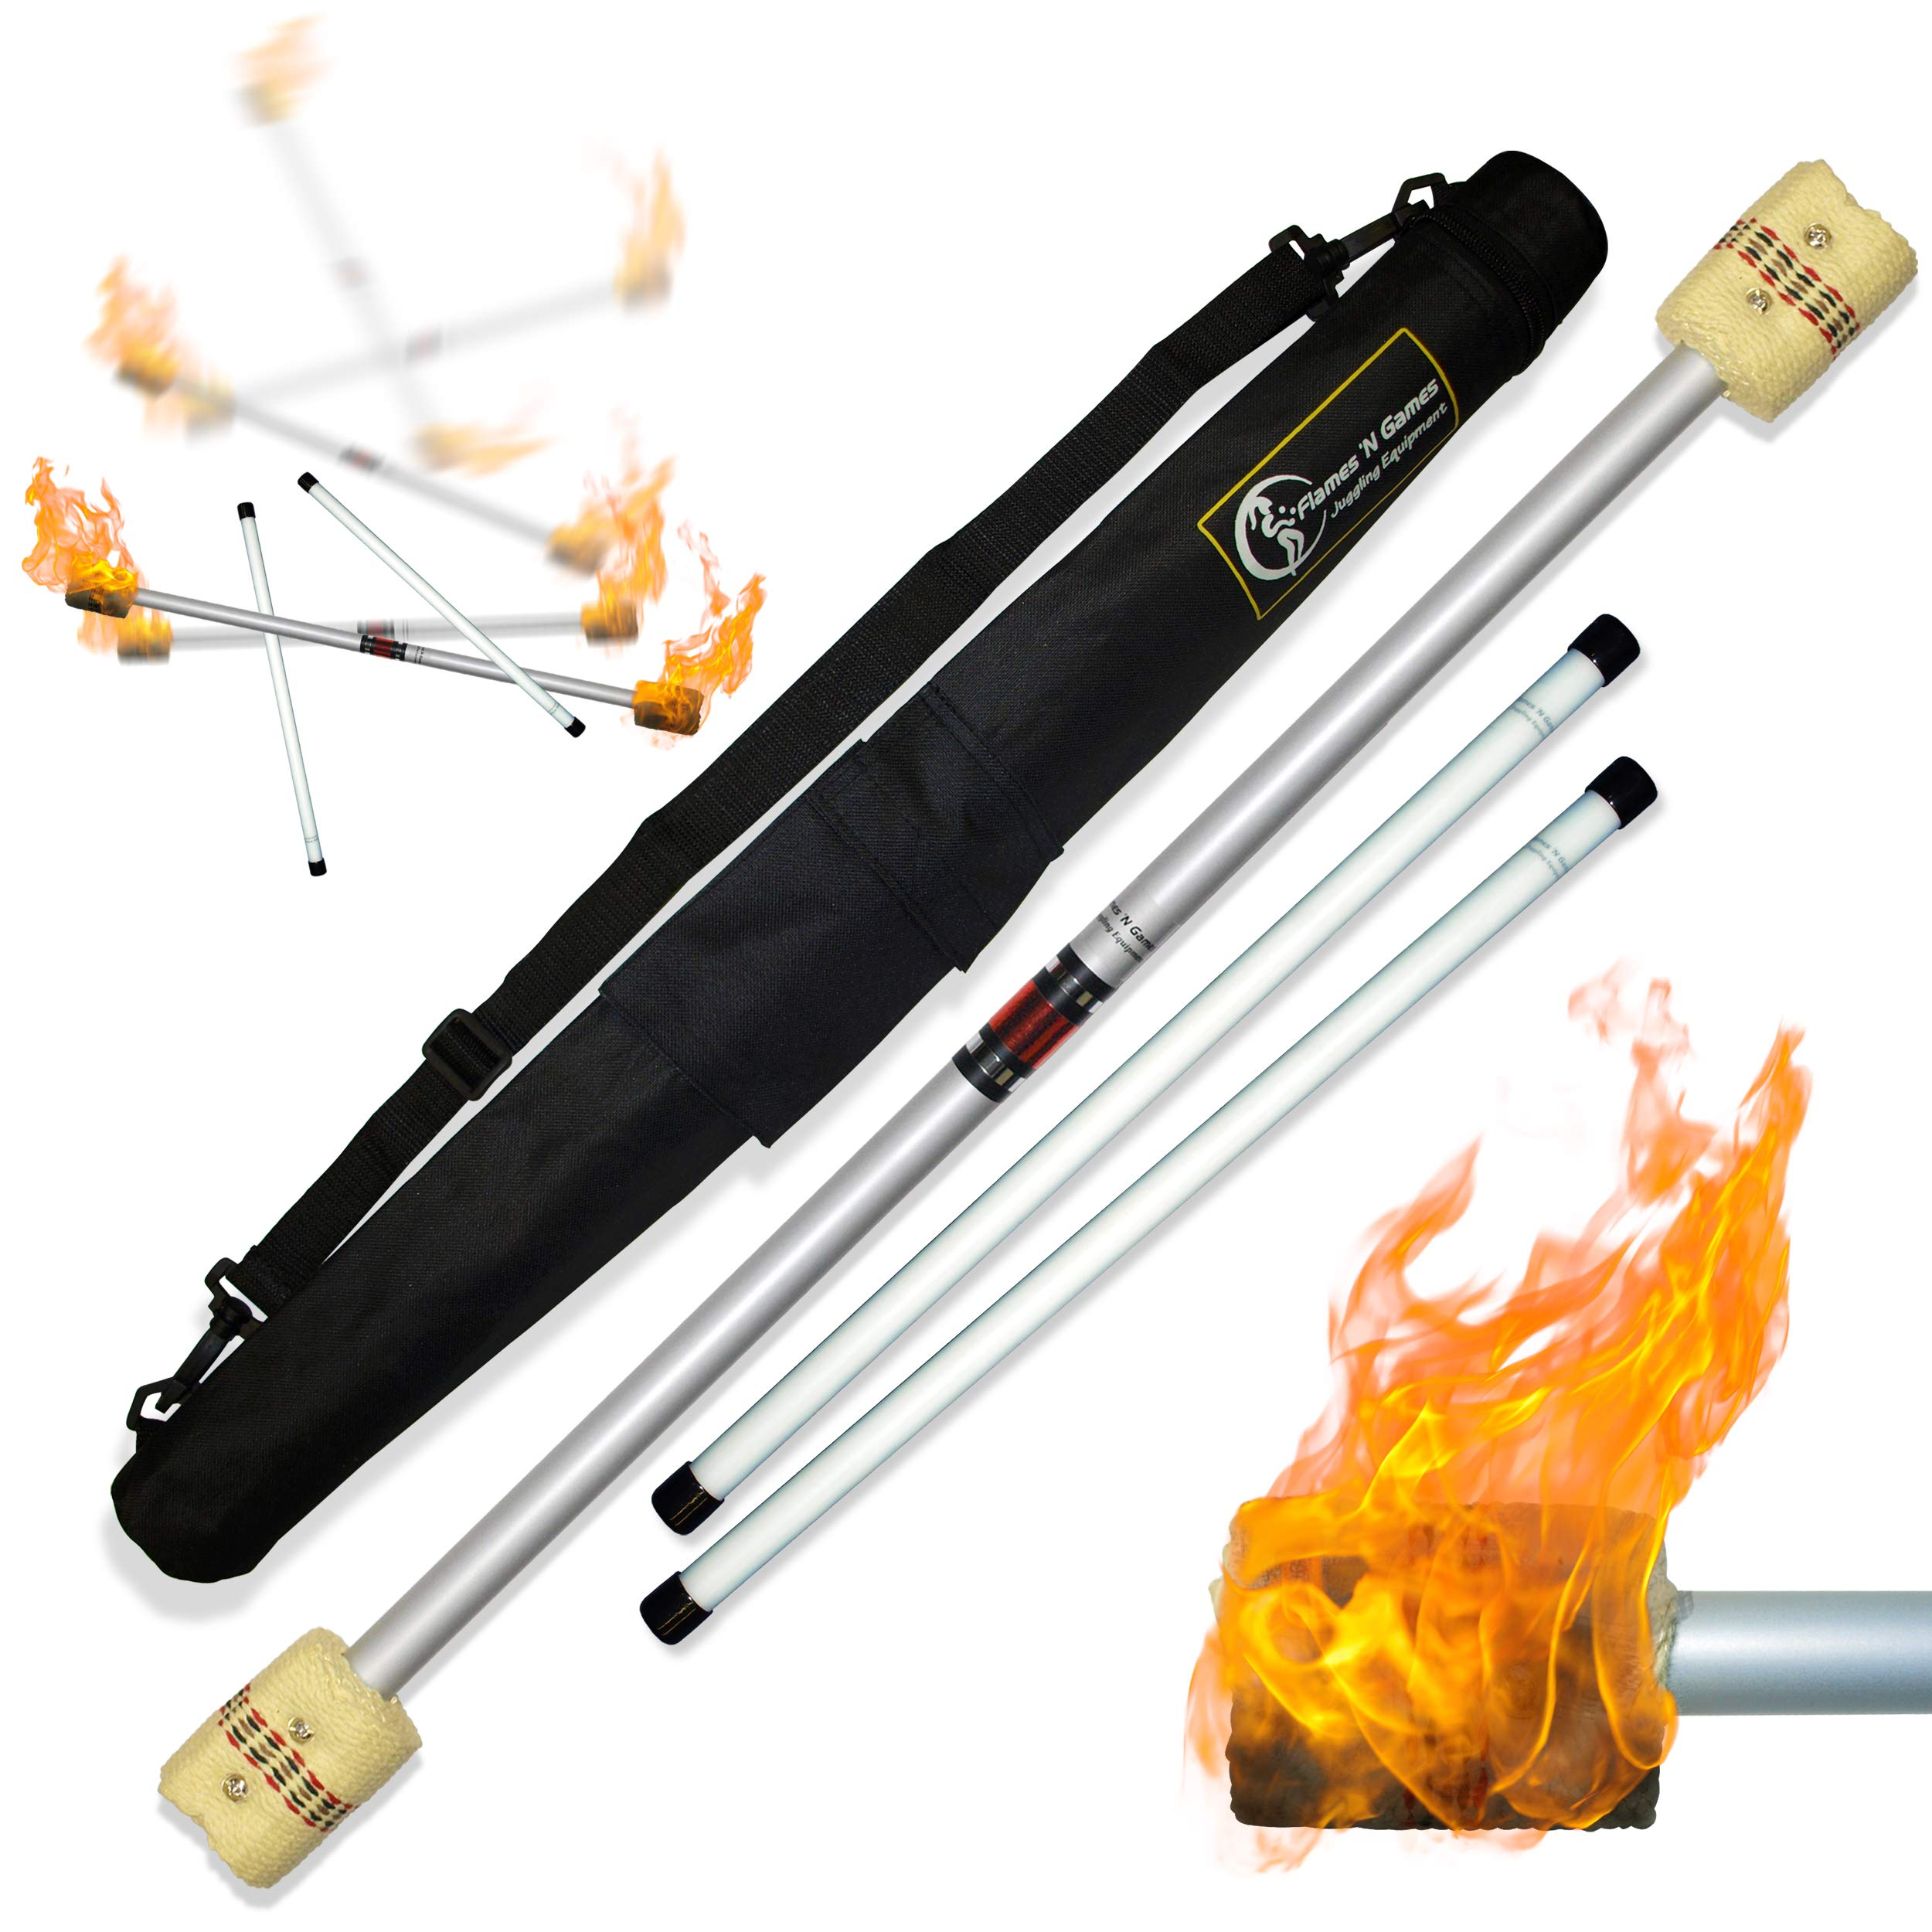 Flames N Games FIRE Devil Stick Set (65mm Wicks) Ultra-Strong FIBRE Sticks + Travel Bag! Juggling Devil sticks for Beginners & Pro's alike! by Flames N Games Fire Devil Sticks/Flower Sticks